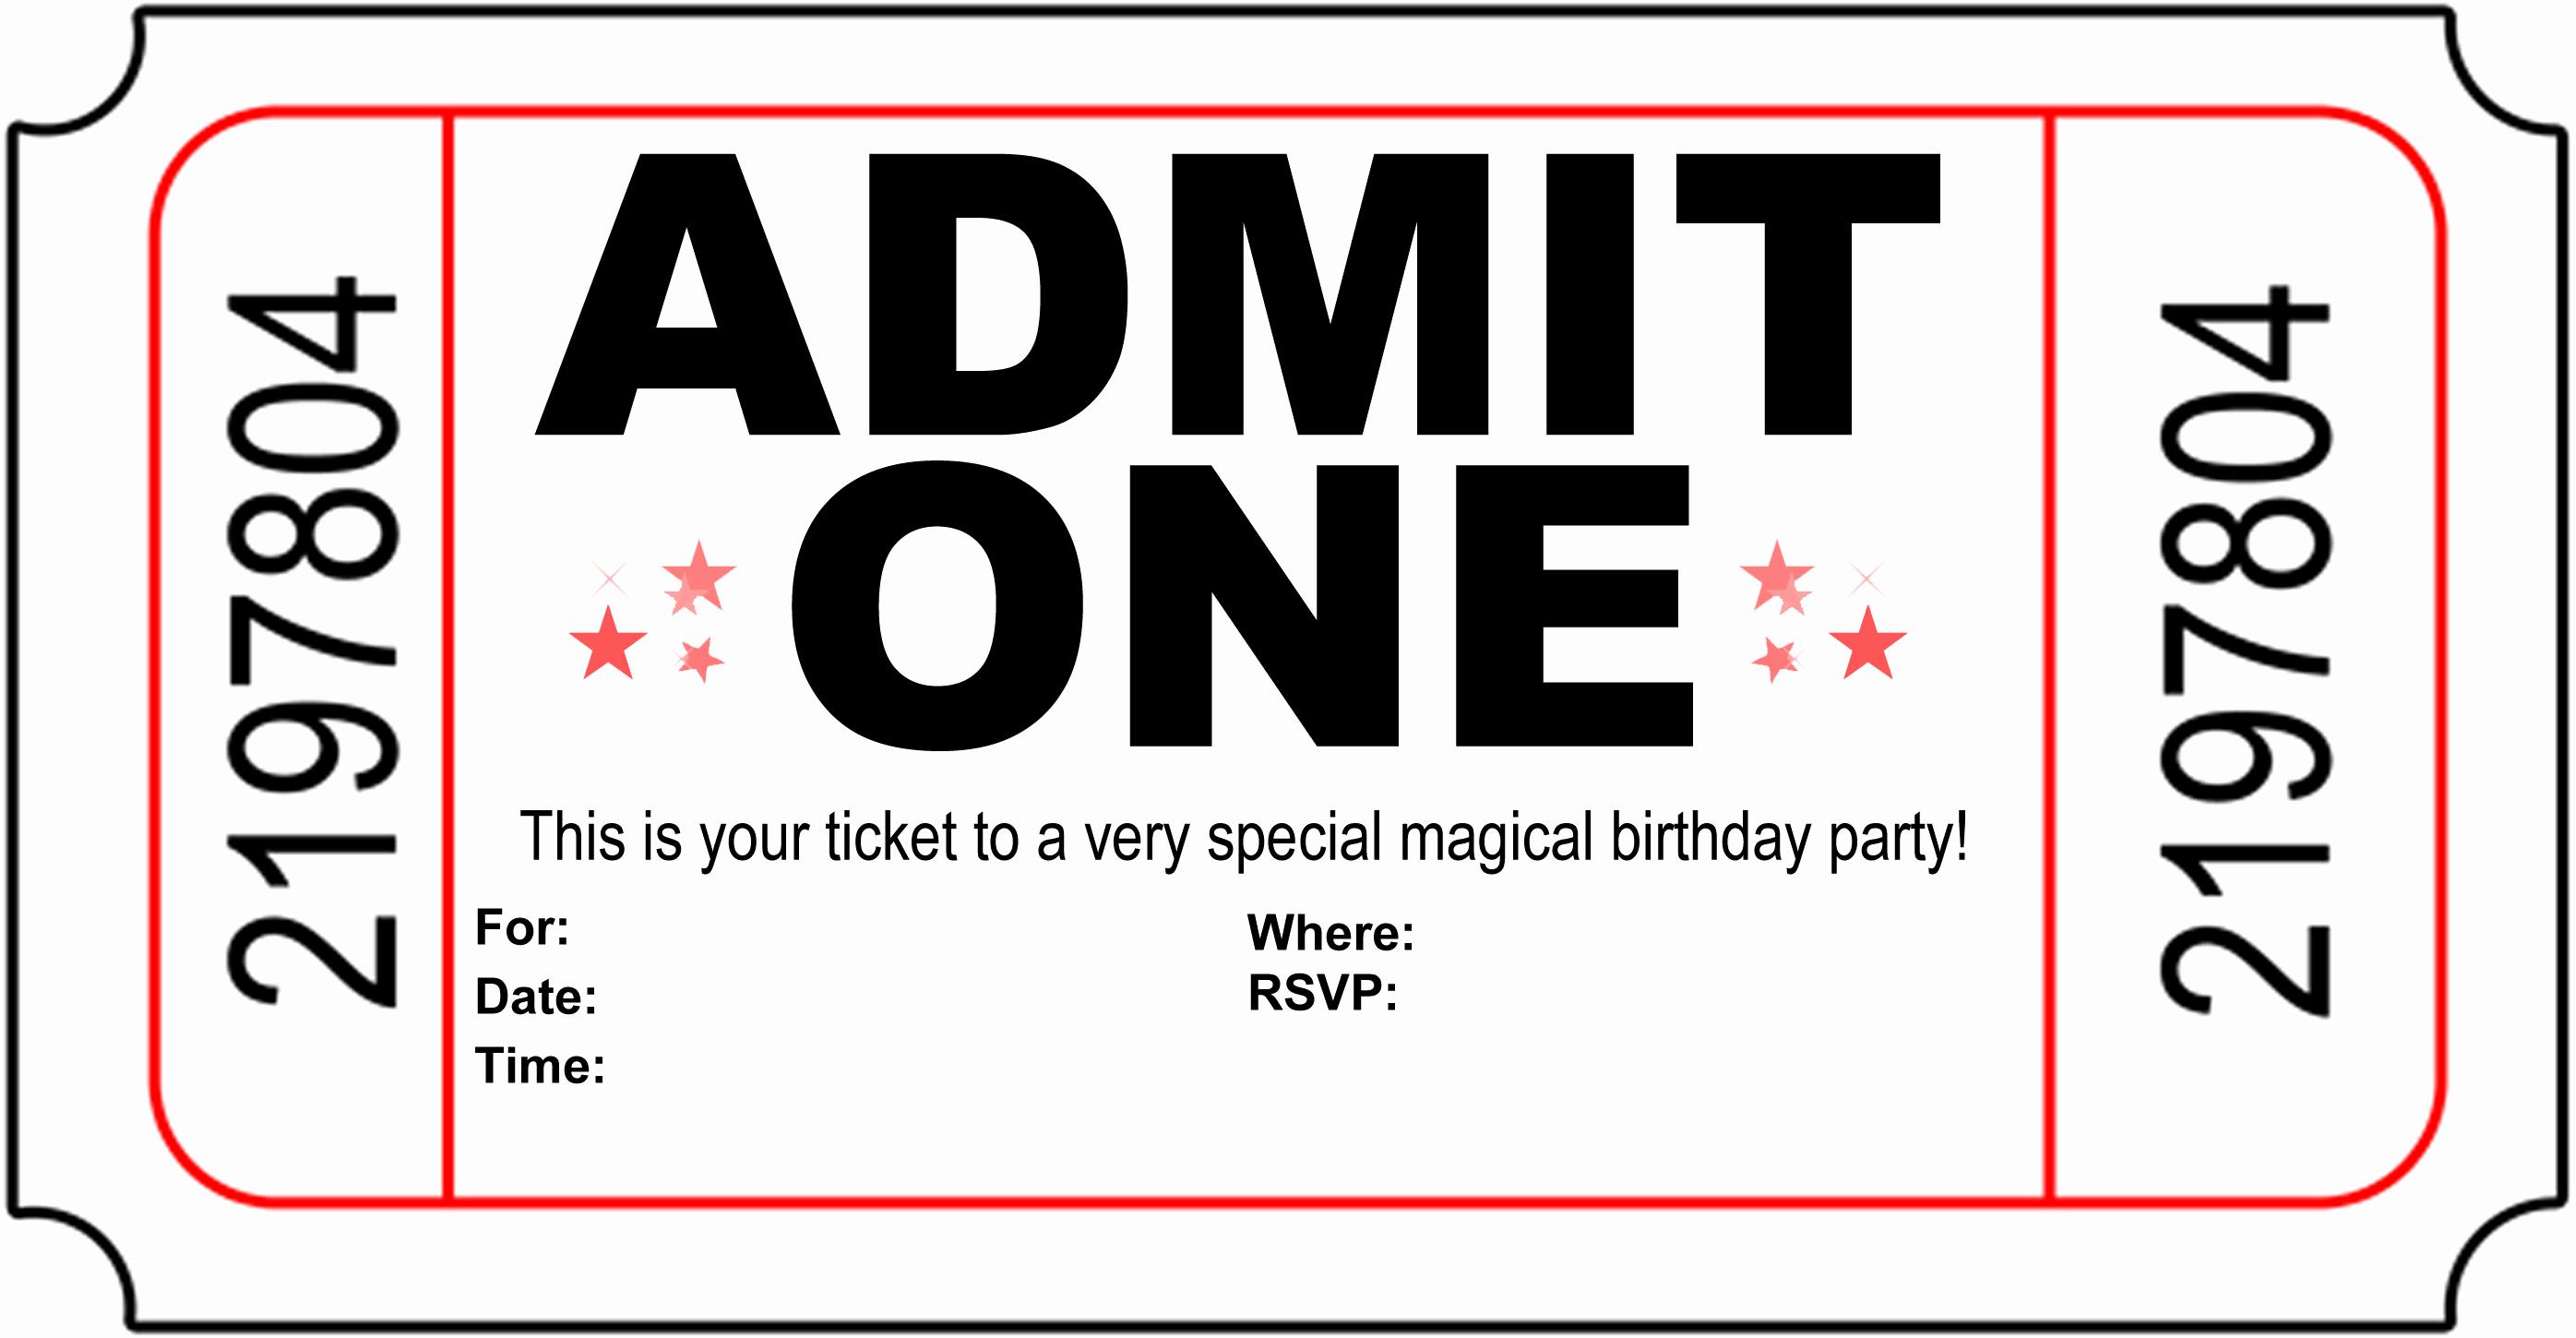 Free Birthday Party Invitation Template Beautiful Free Carnival Ticket Invitation Template Download Free